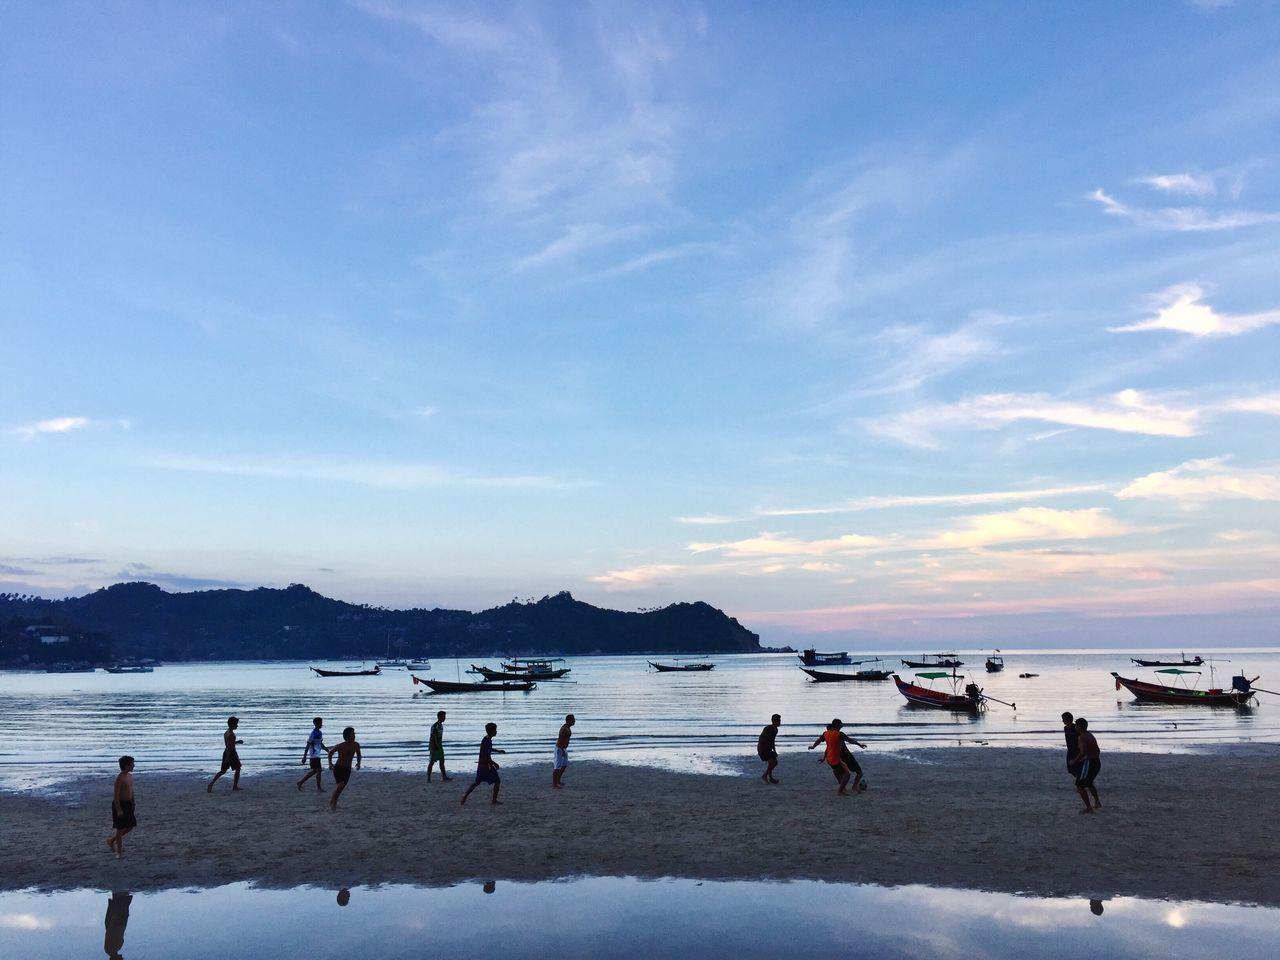 Beach Sunset Soccer Thai Boat Longtailboat Nature Kids Football The Great Outdoors - 2017 EyeEm Awards